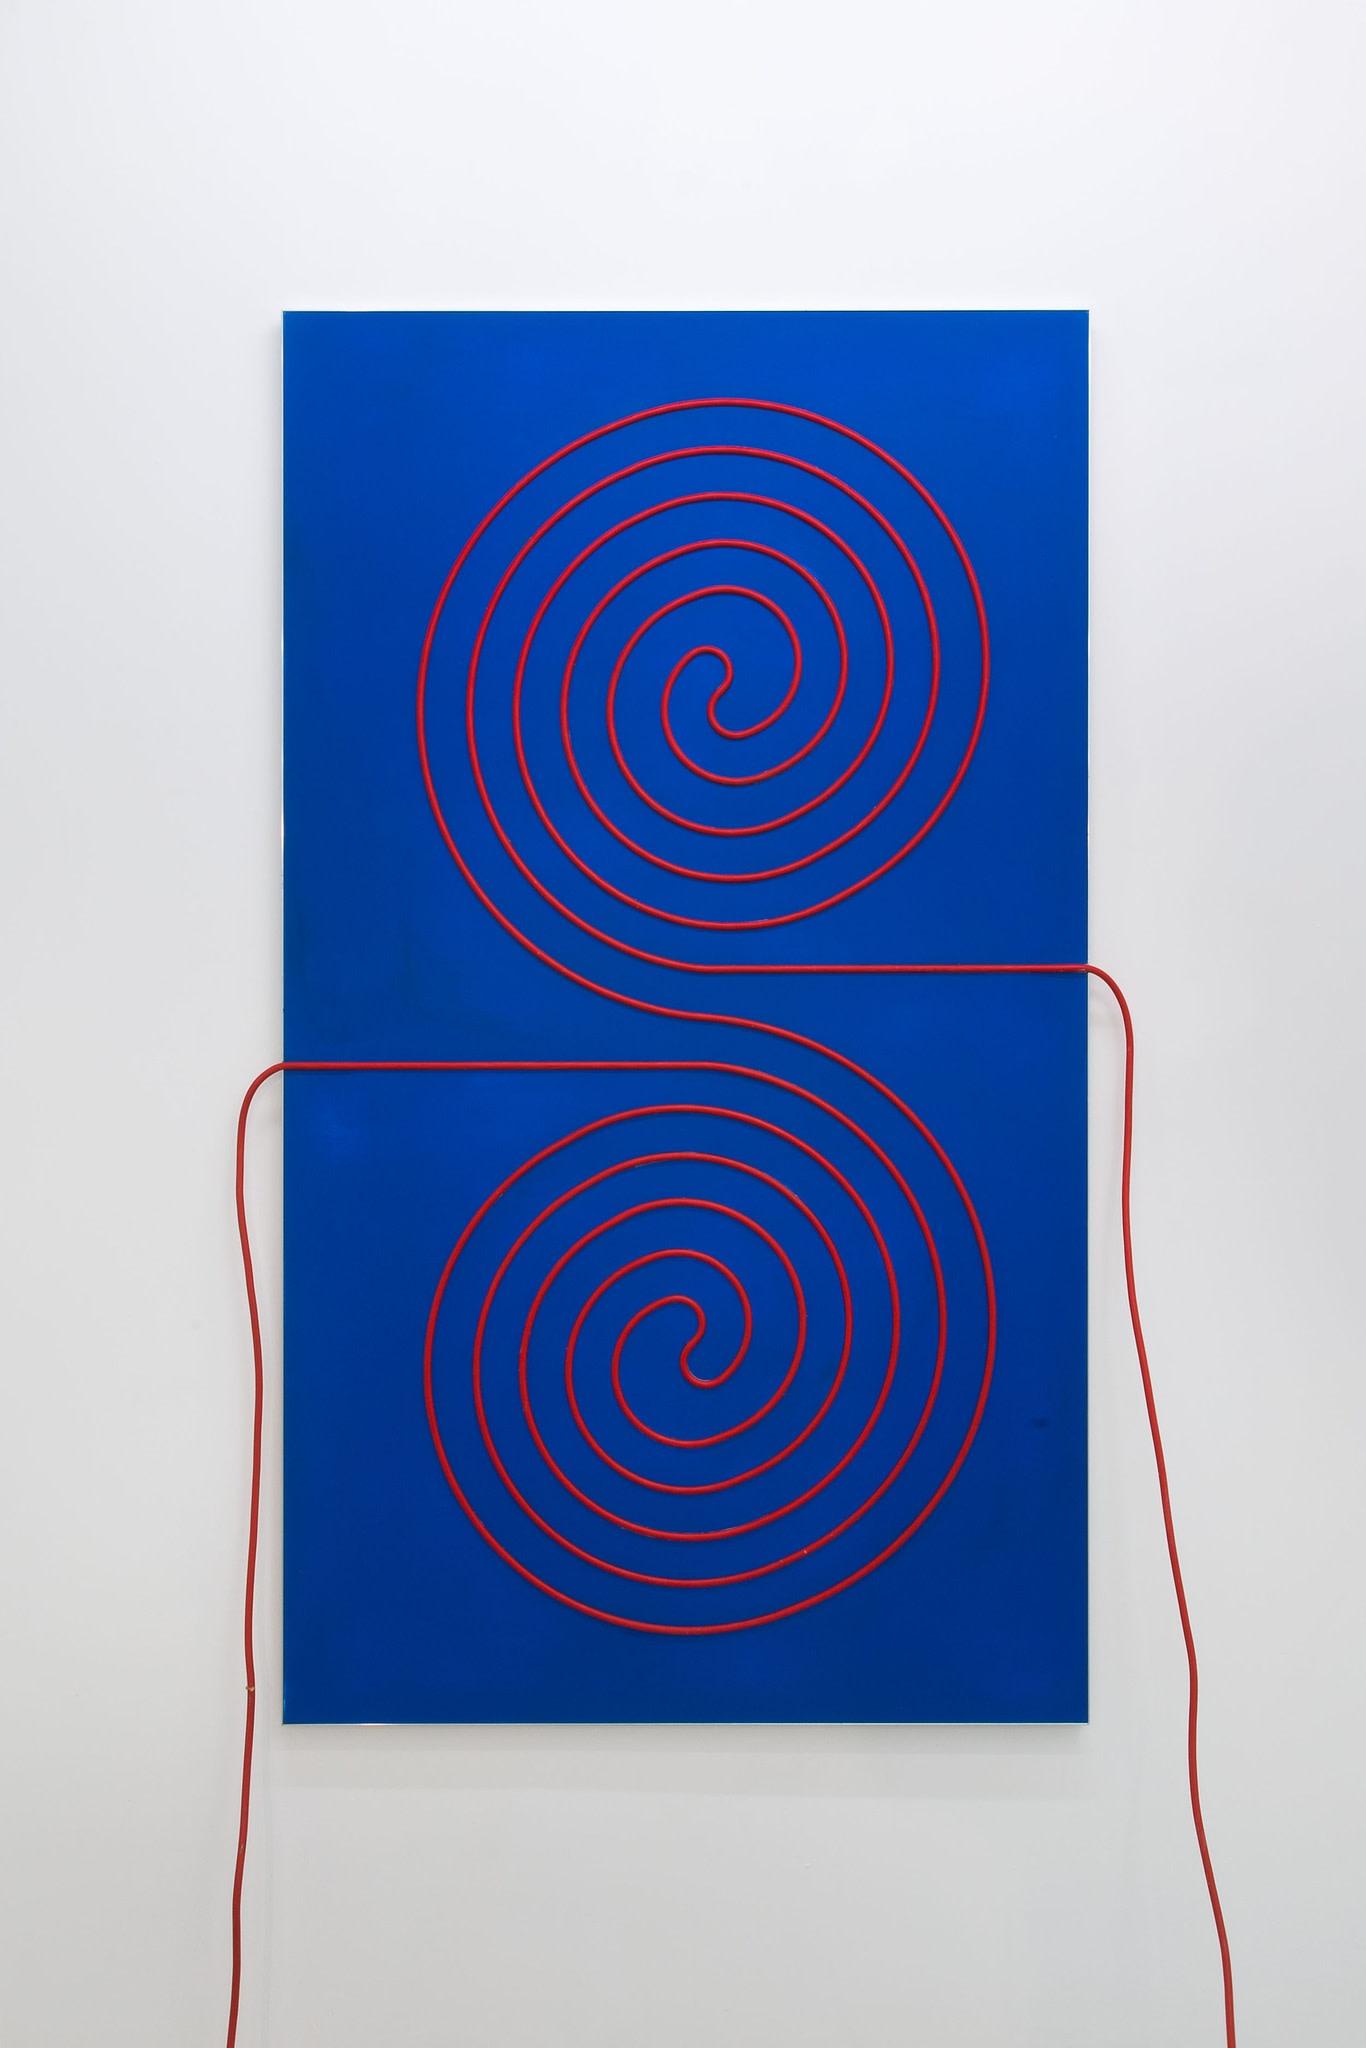 <span class=&#34;link fancybox-details-link&#34;><a href=&#34;/artists/44-jacob-dahlgren/works/8764/&#34;>View Detail Page</a></span><div class=&#34;artist&#34;><strong>Jacob Dahlgren</strong></div> <div class=&#34;title&#34;><em>Third Uncle #9</em>, 2015</div> <div class=&#34;medium&#34;>MDF, acrylic paint, electrical cable, aluminium</div> <div class=&#34;dimensions&#34;>150 x 85 cm<br />59 1/8 x 33 1/2 in</div><div class=&#34;copyright_line&#34;>Copyright The Artist</div>